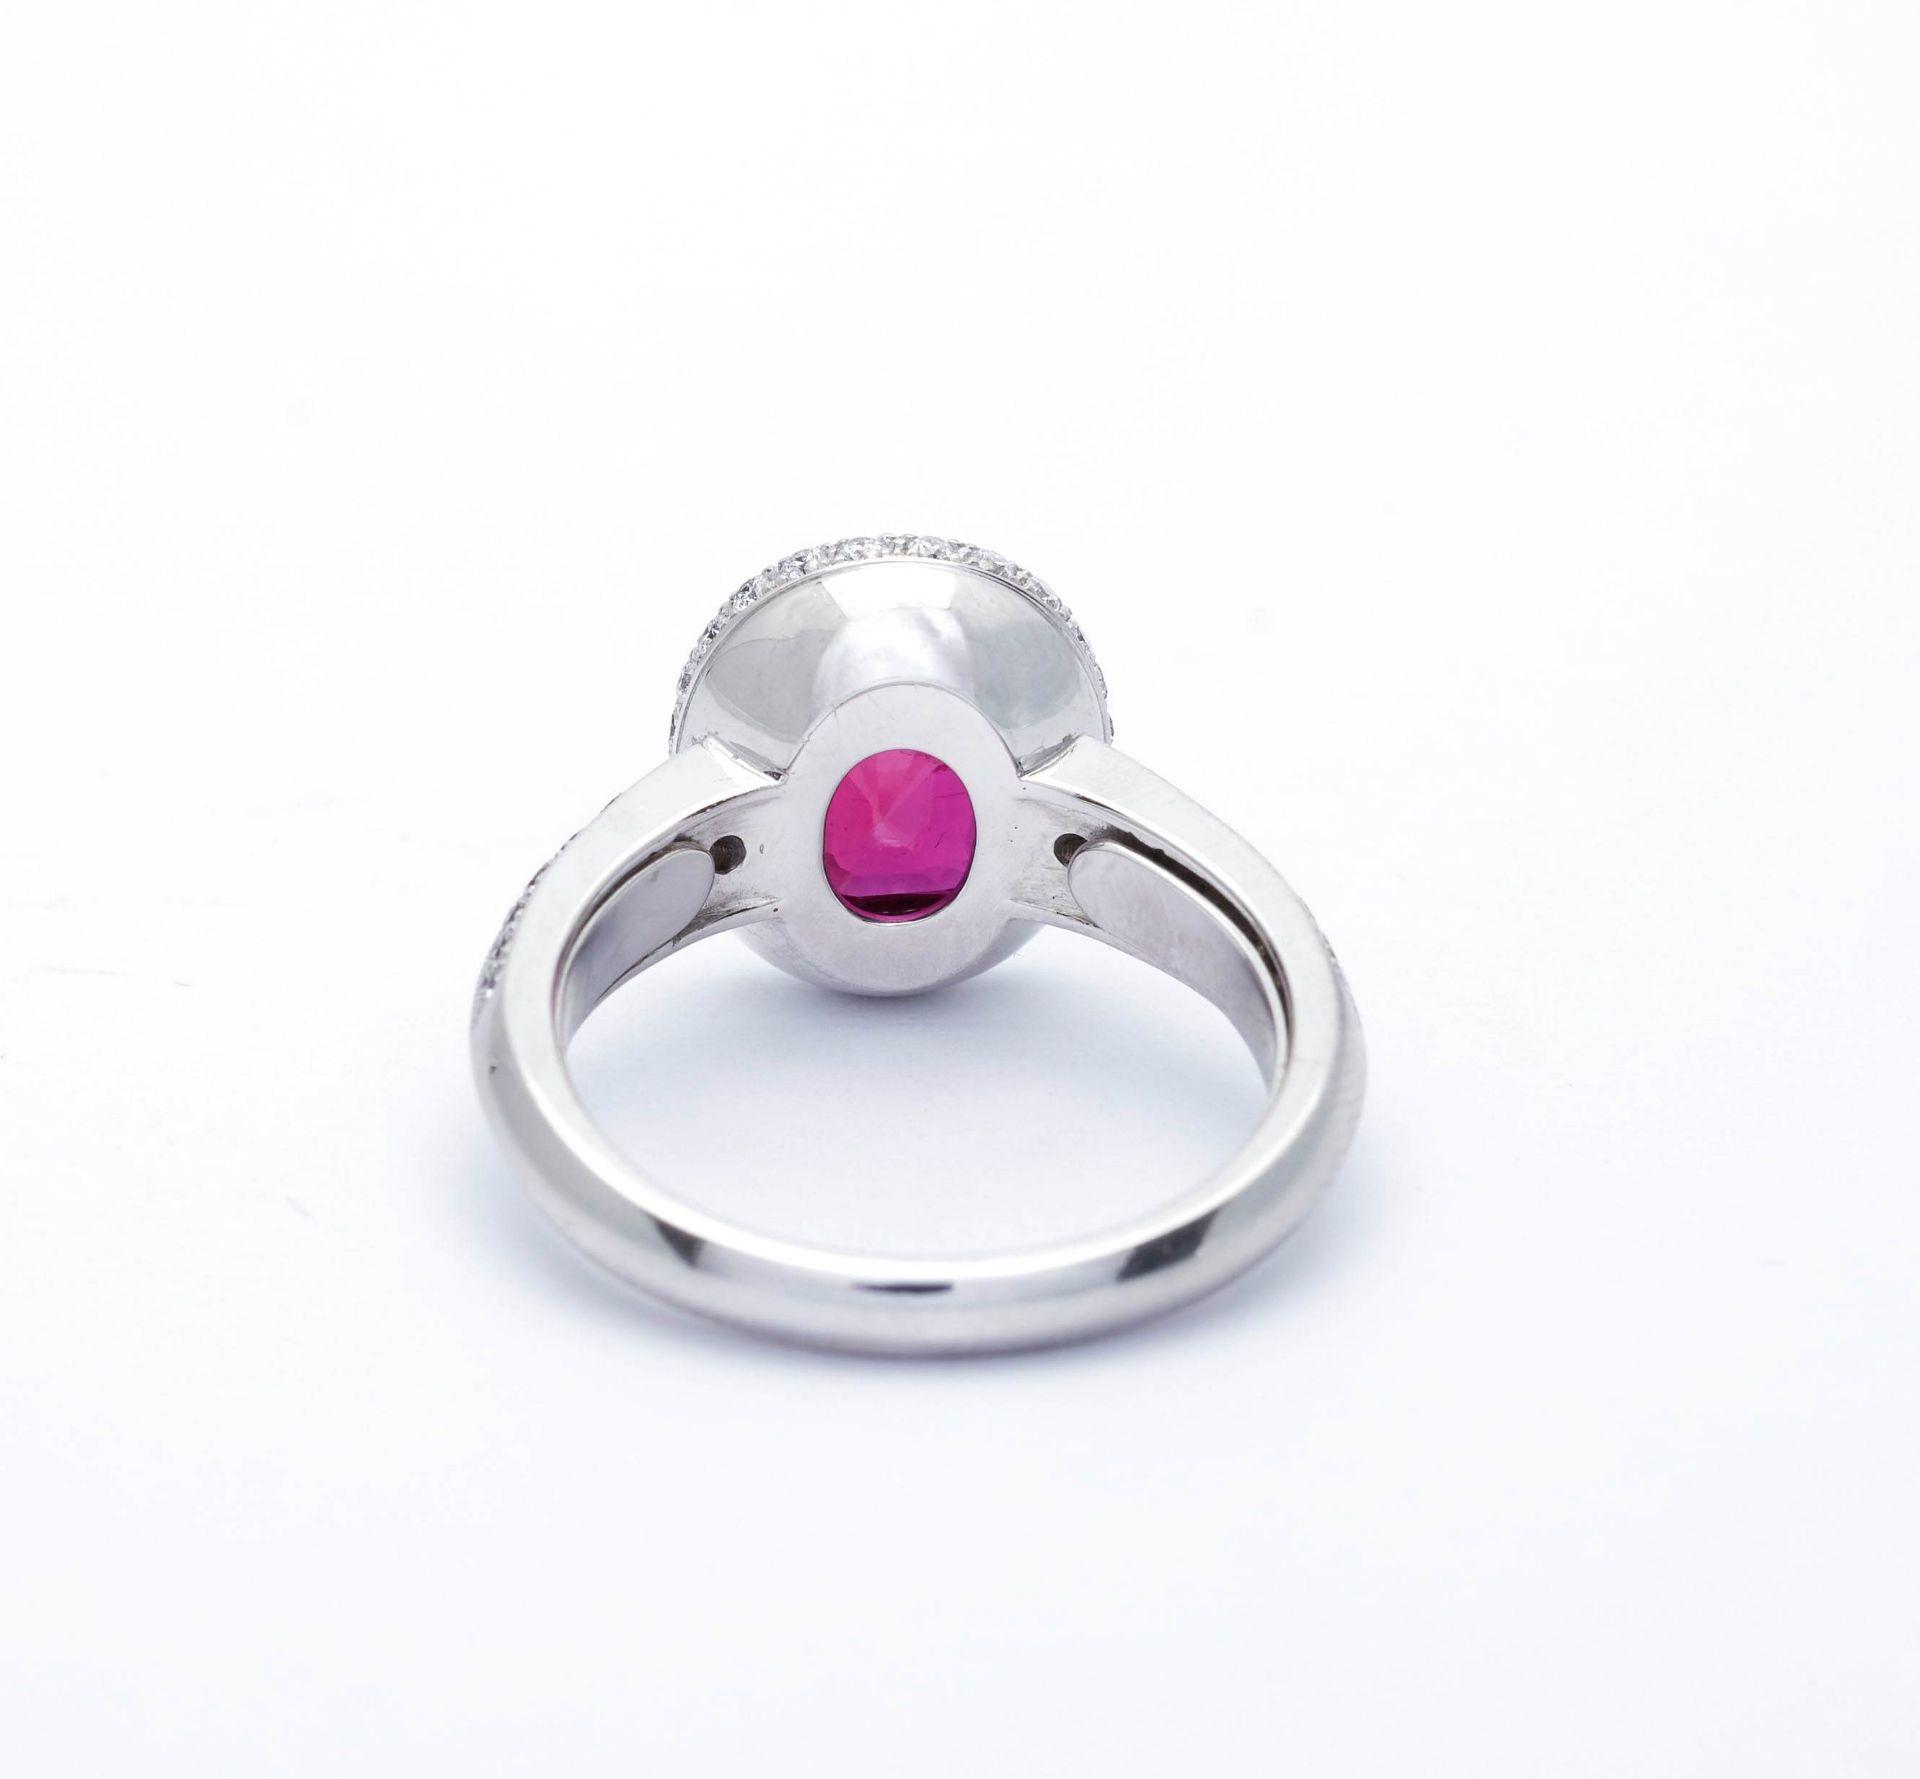 BURMA RUBY AND DIAMOND RING, BY PÉCLARD. - Image 8 of 9